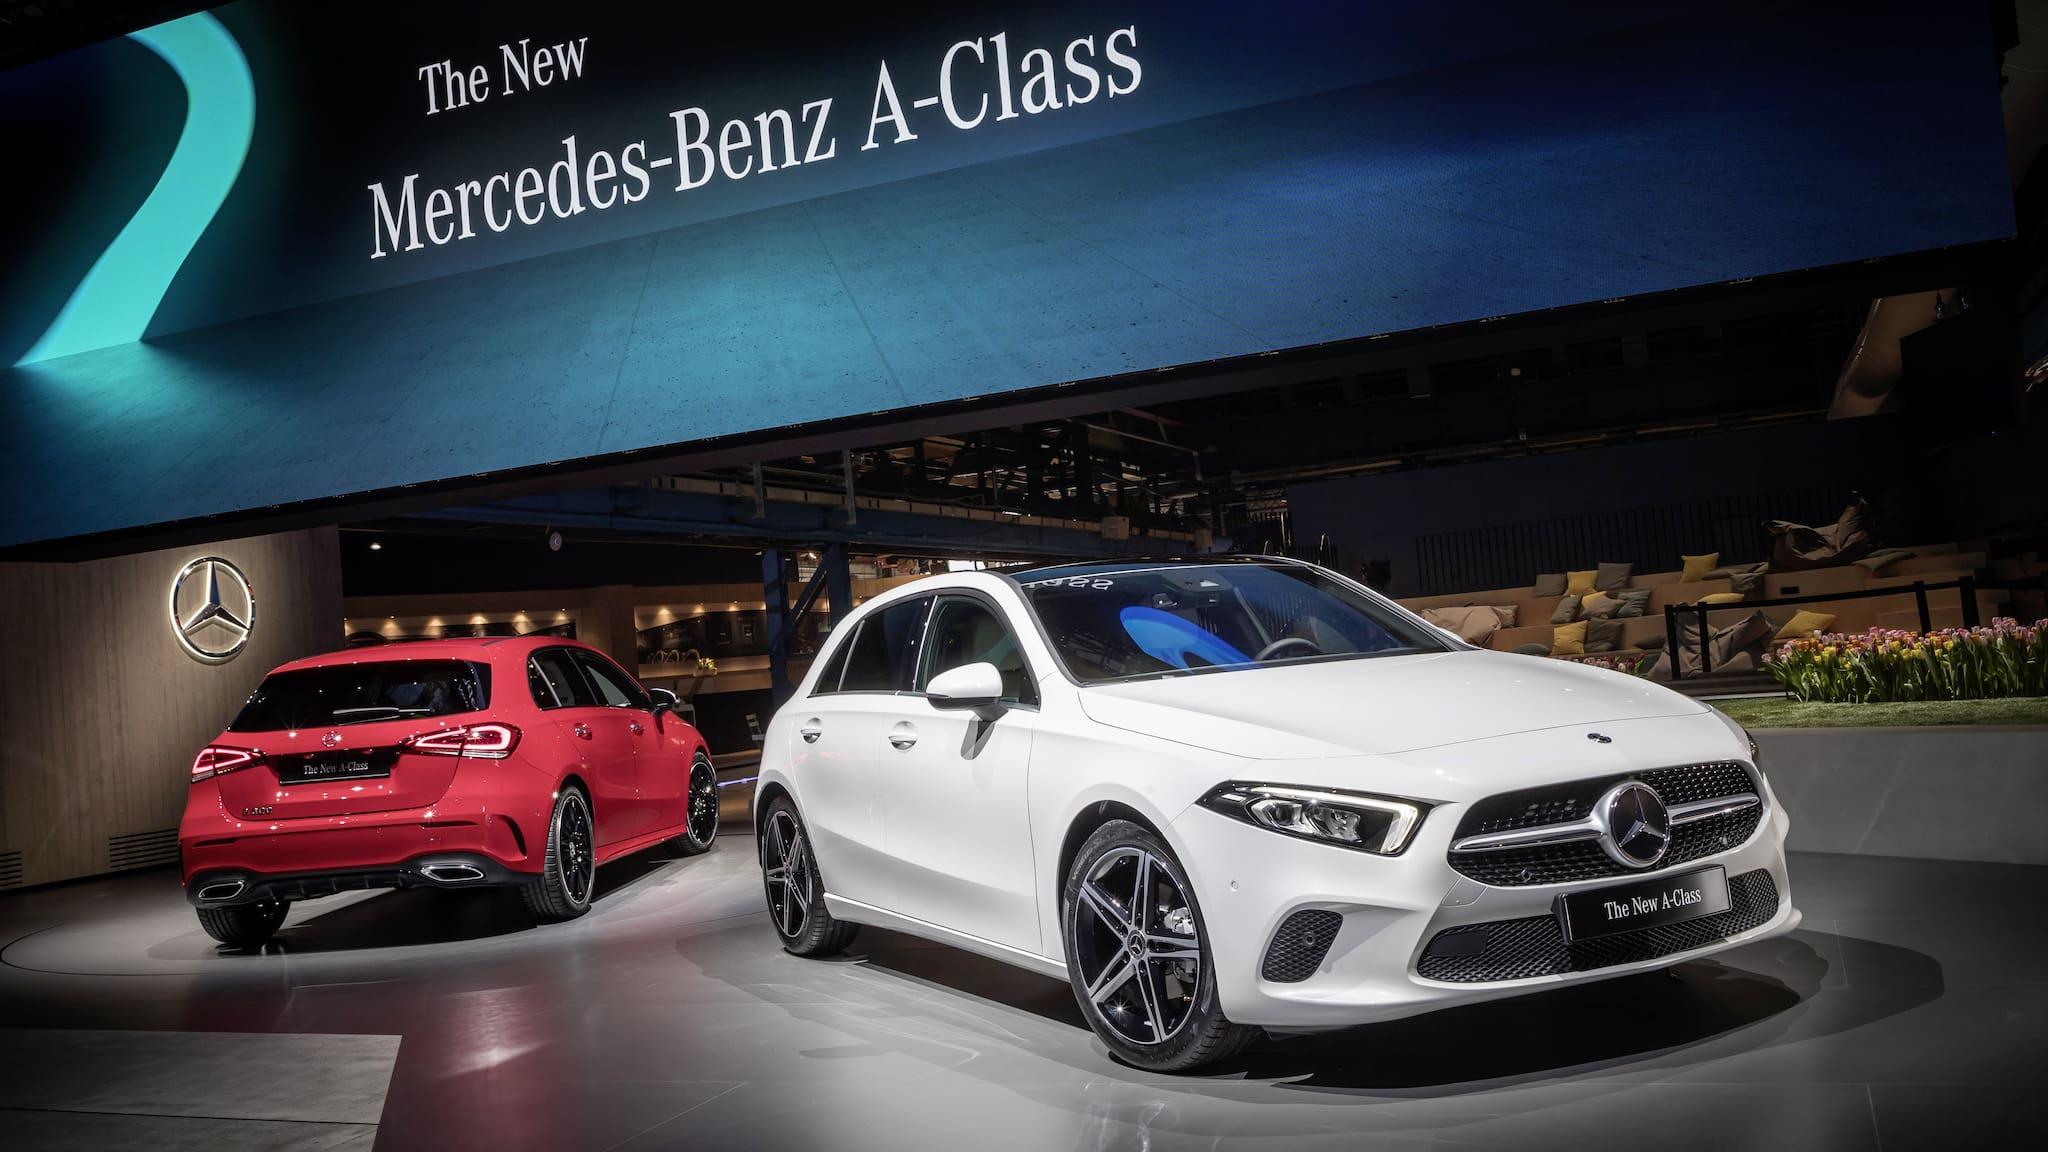 Mercedes-Benz PH to Launch All-New Mercedes-Benz A-Class This Week